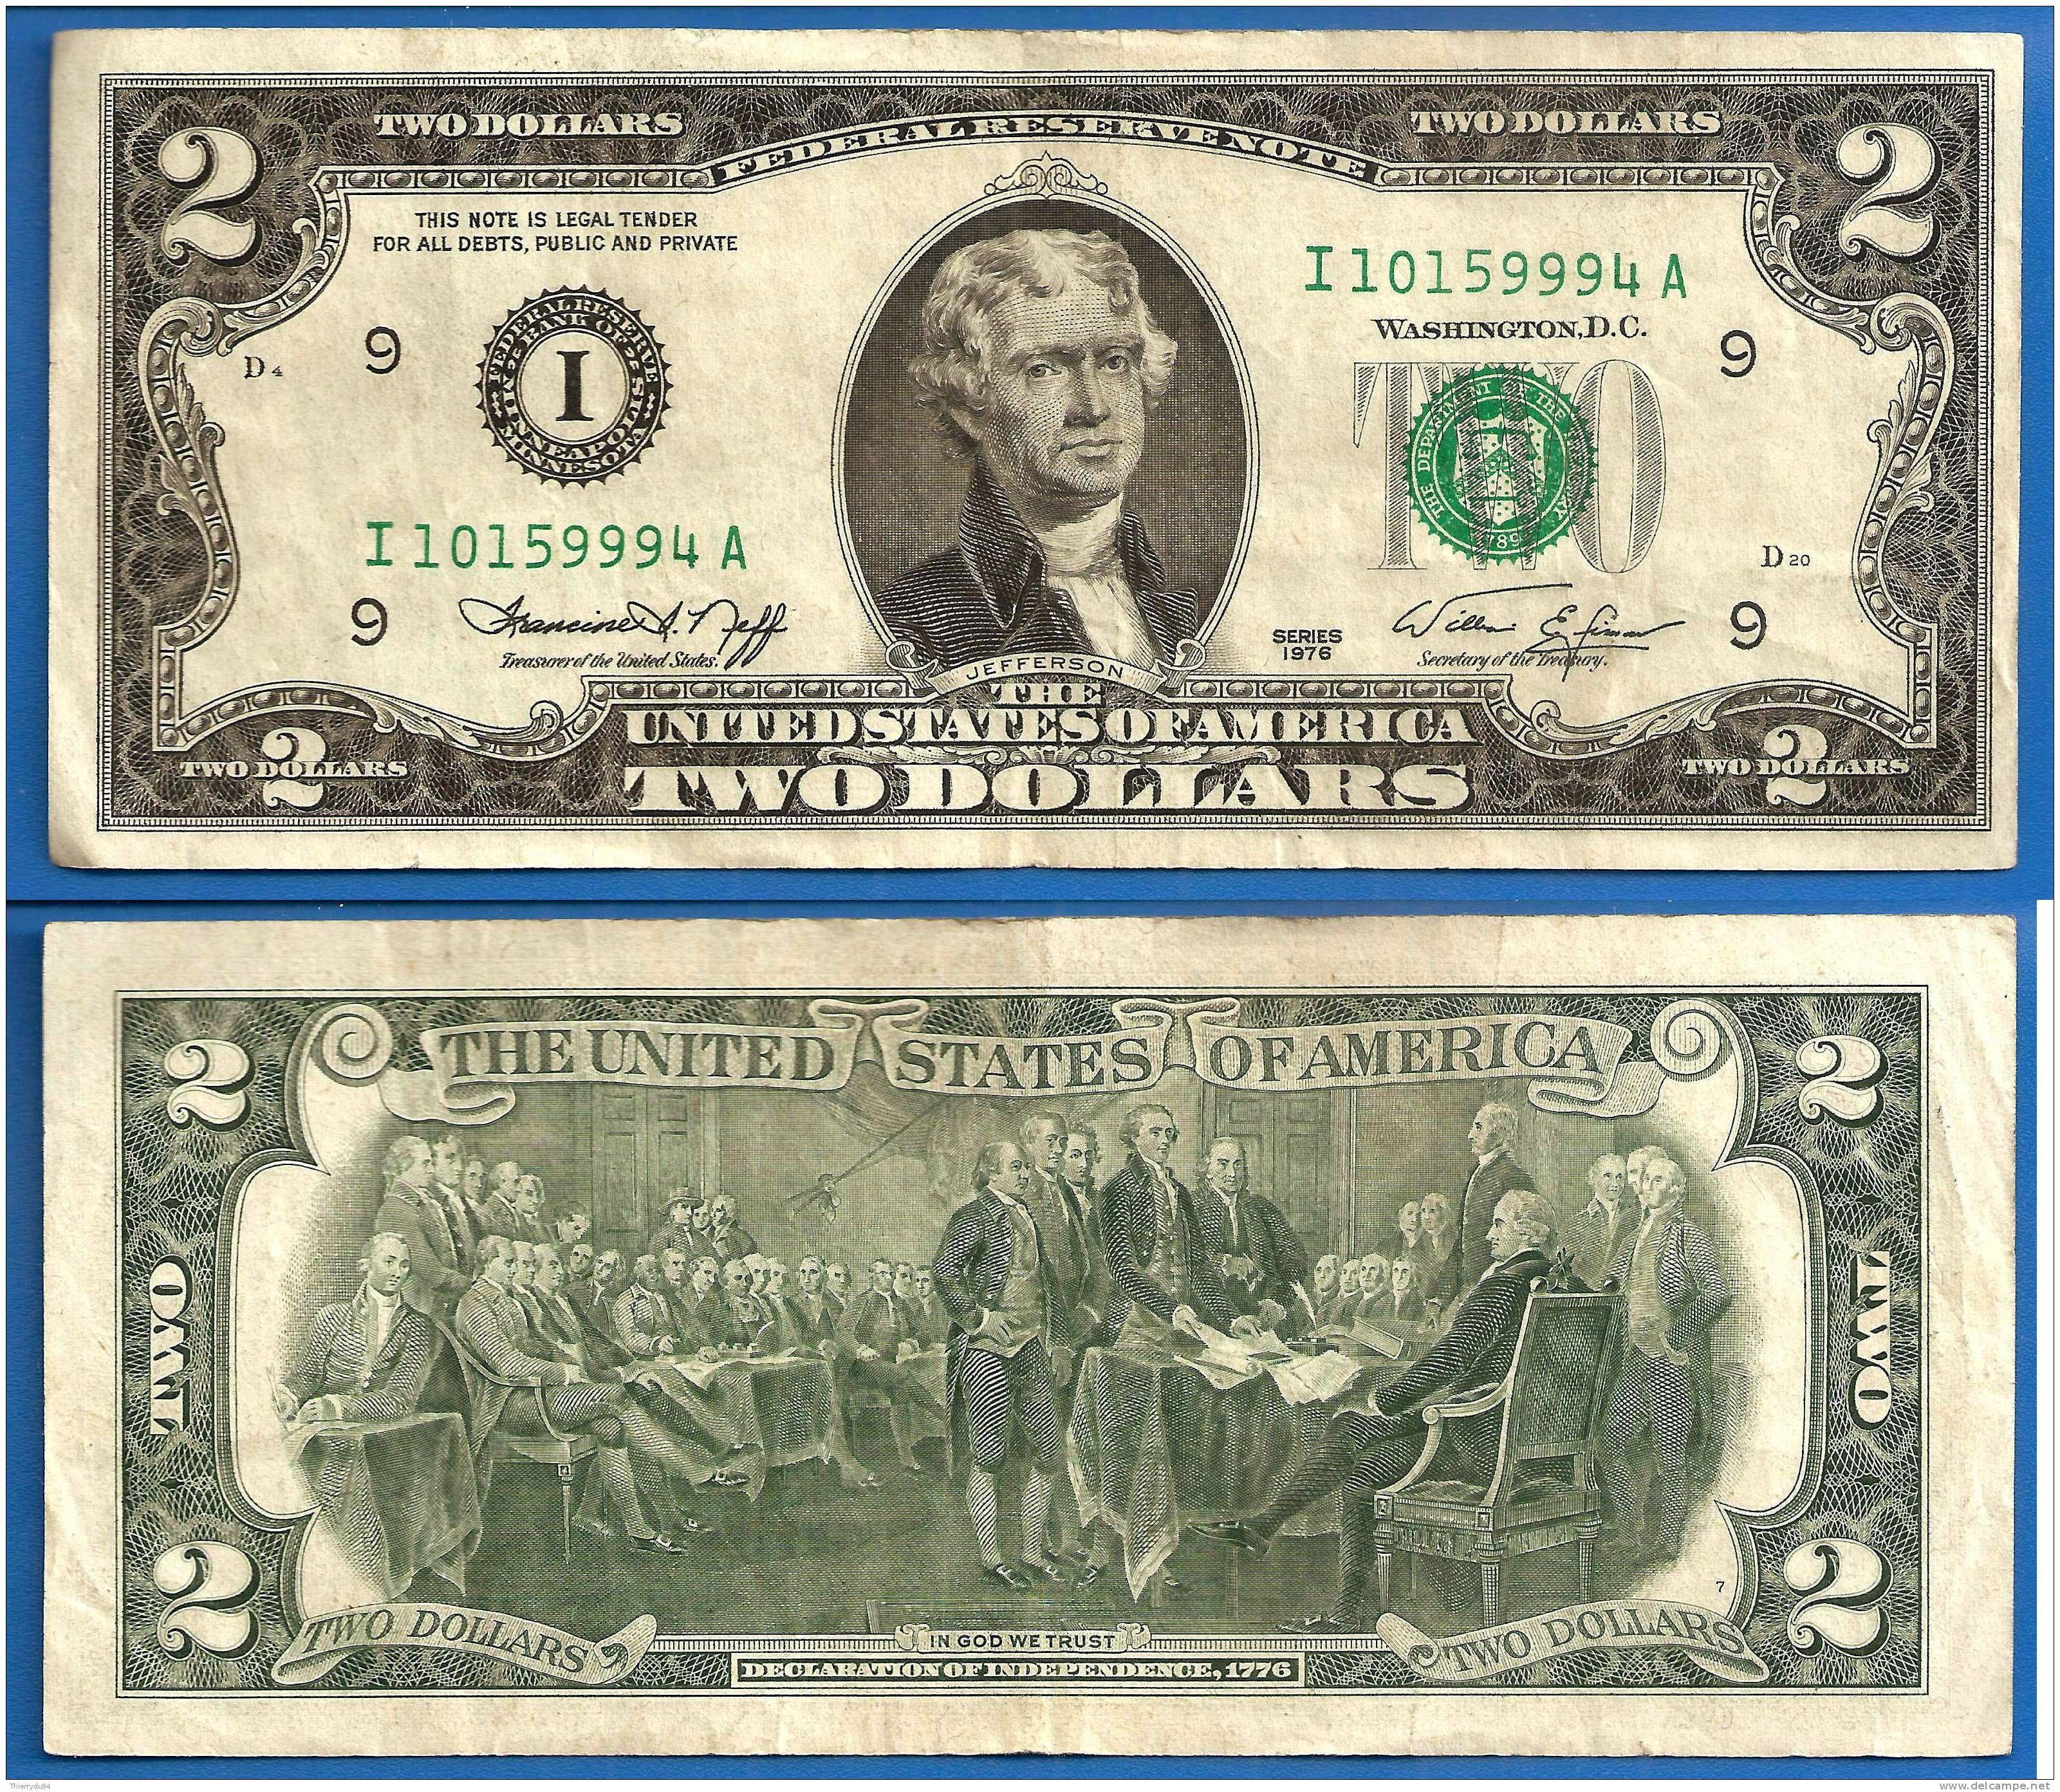 Usa 2 Dollars 1976 Jefferson Mint Minneapolis I9 Prefix E Etats Unis United States Dollars Us Billet De Banque Tableau Pop Art Dollar